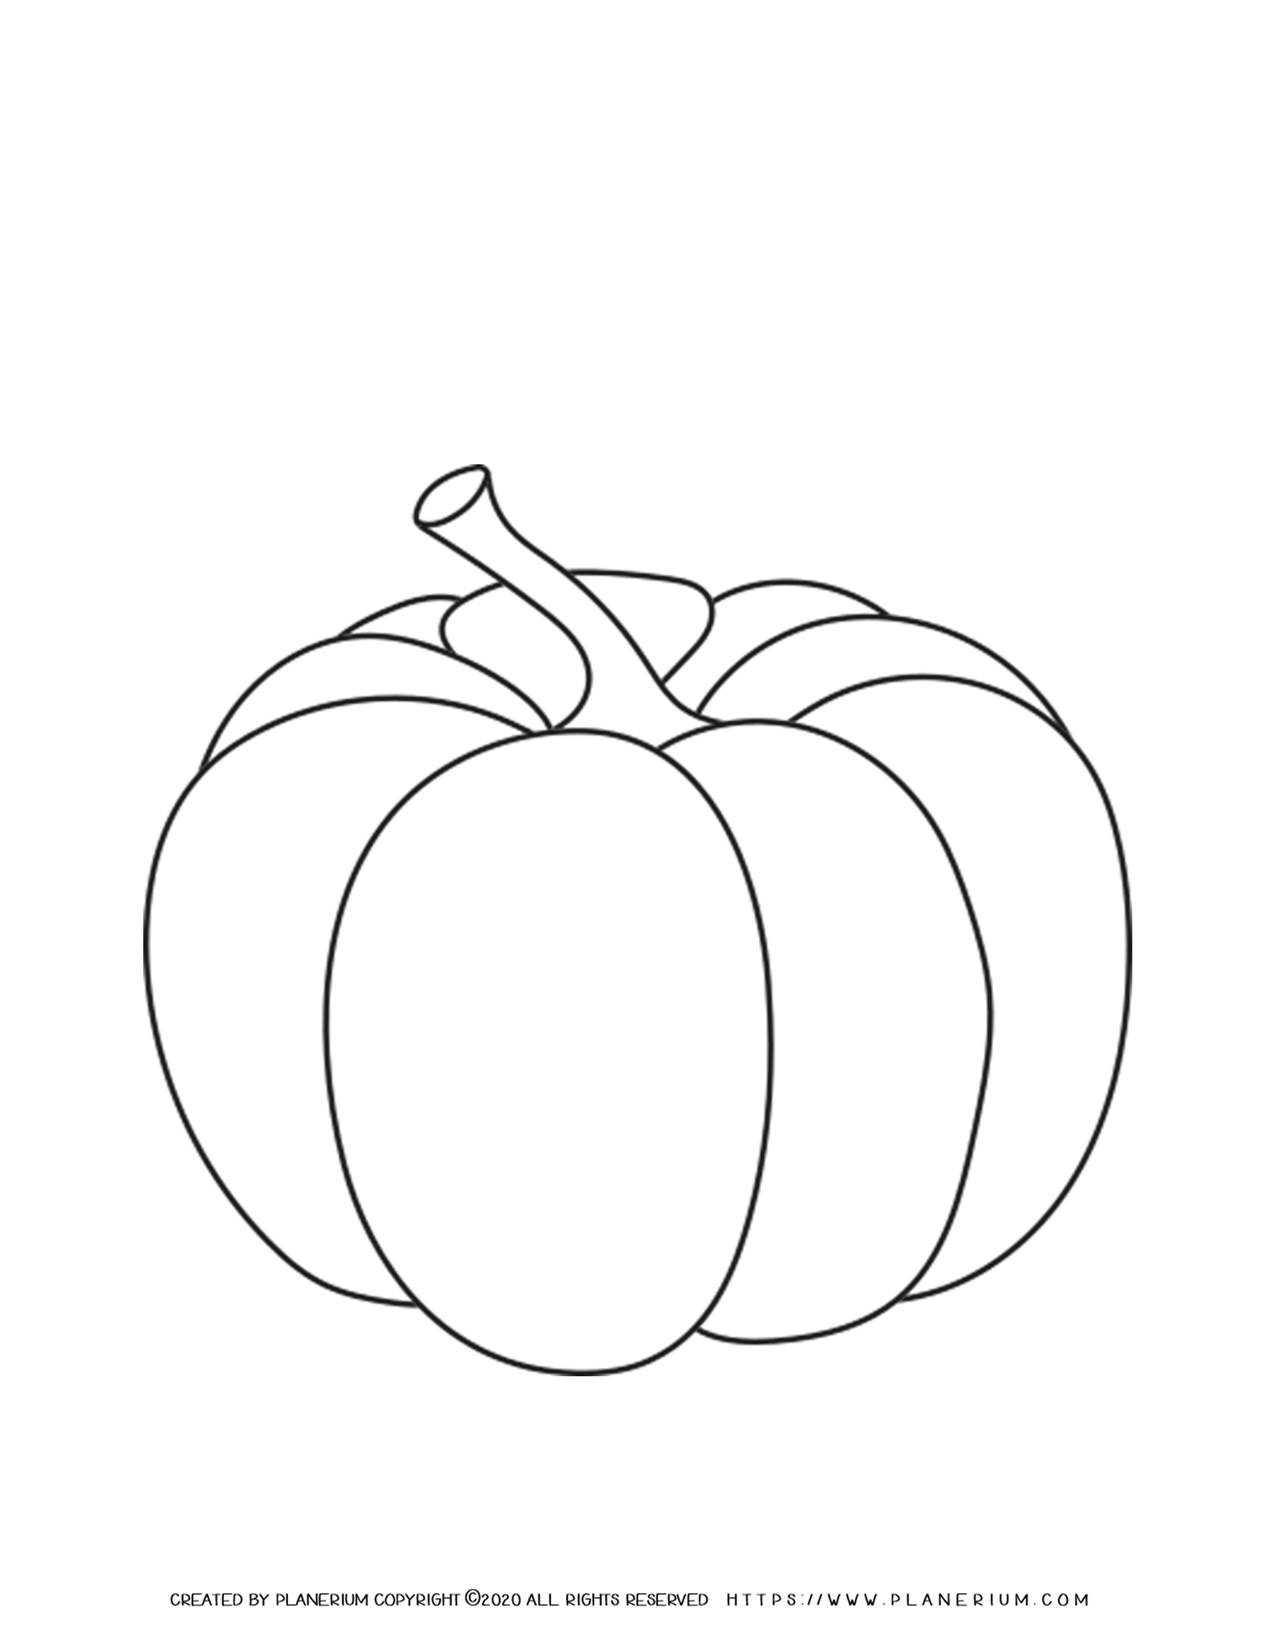 Pumpkin Coloring Page   Planerium